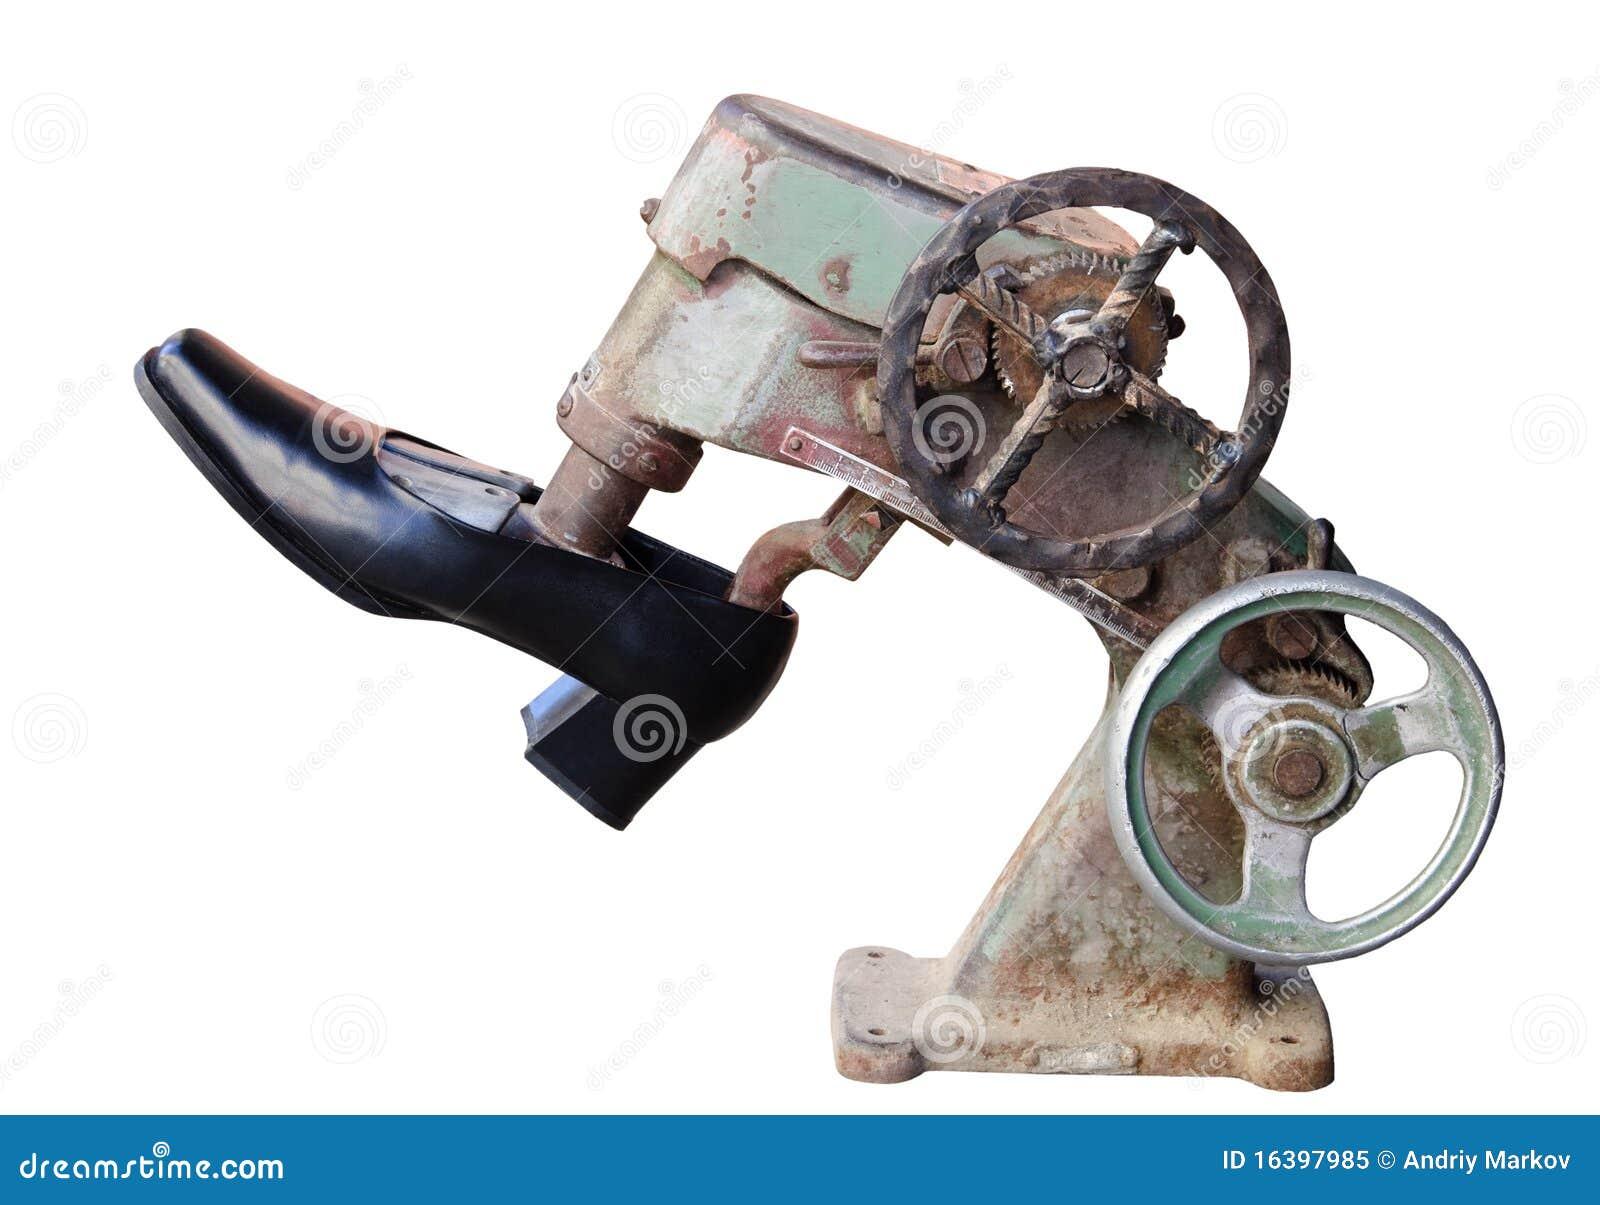 how to set up auto macro in corsair